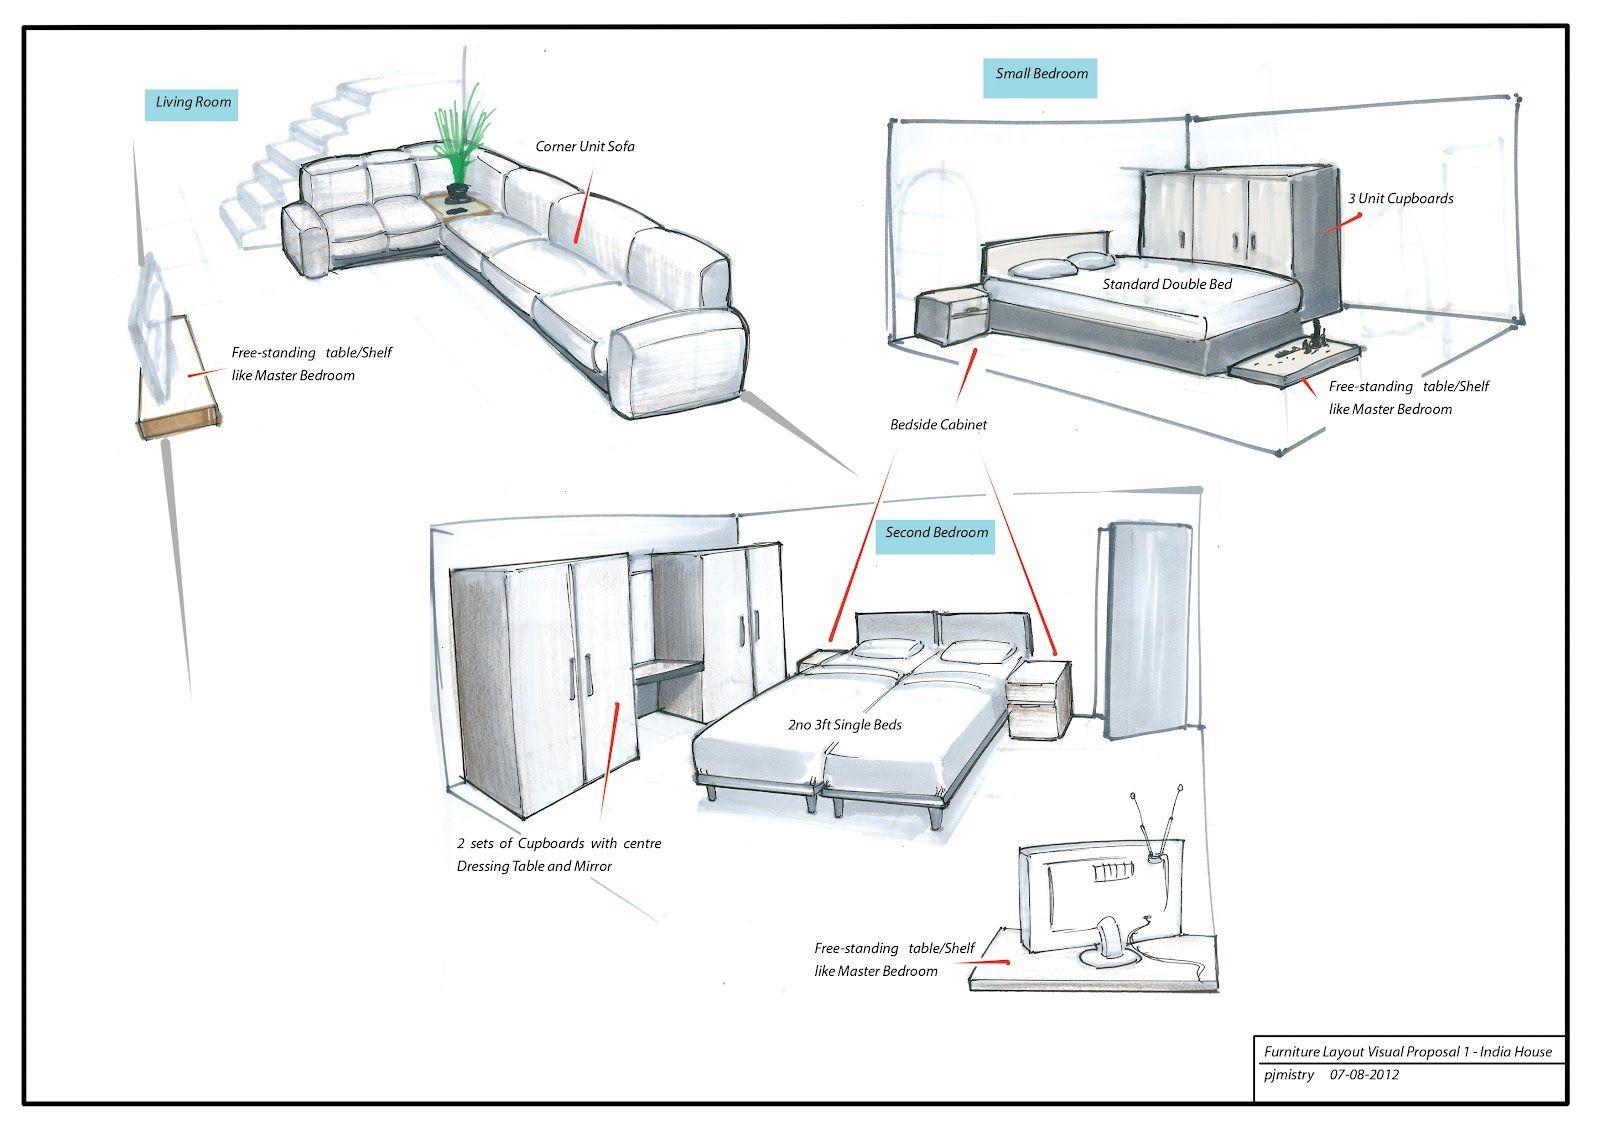 Interior Designing Sketches Home Furniture Sketch Design Layout